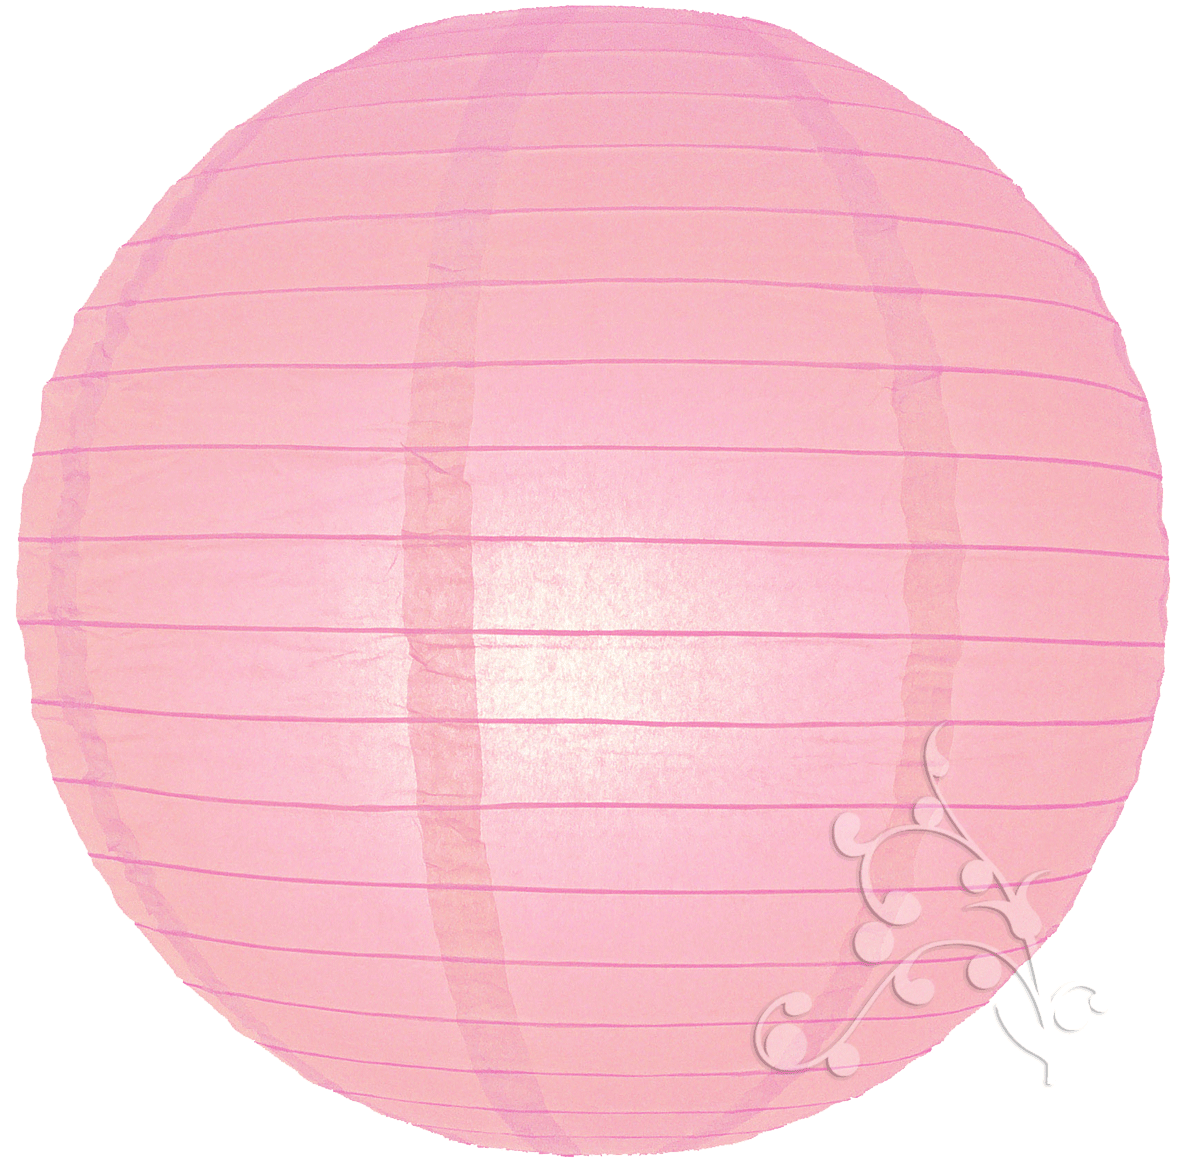 12 Inch Pink Round paper lantern for Paper Lanterns Png  45hul